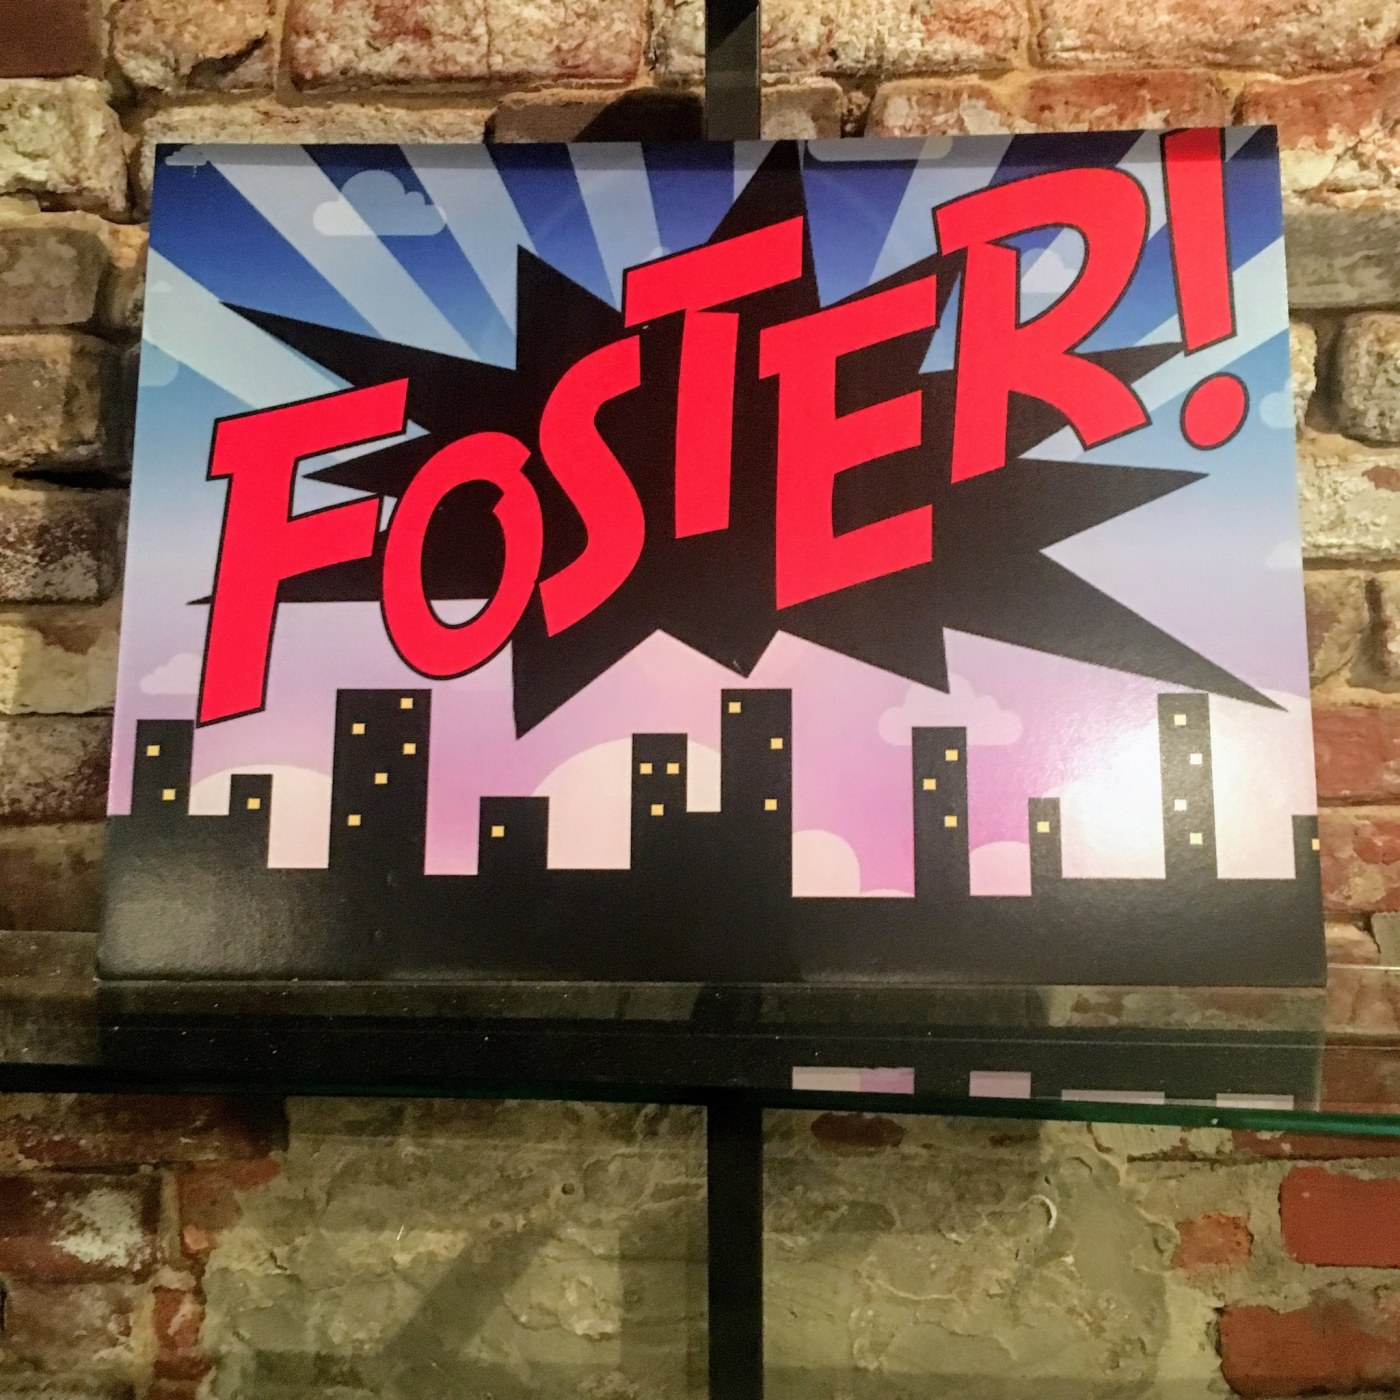 Foster!